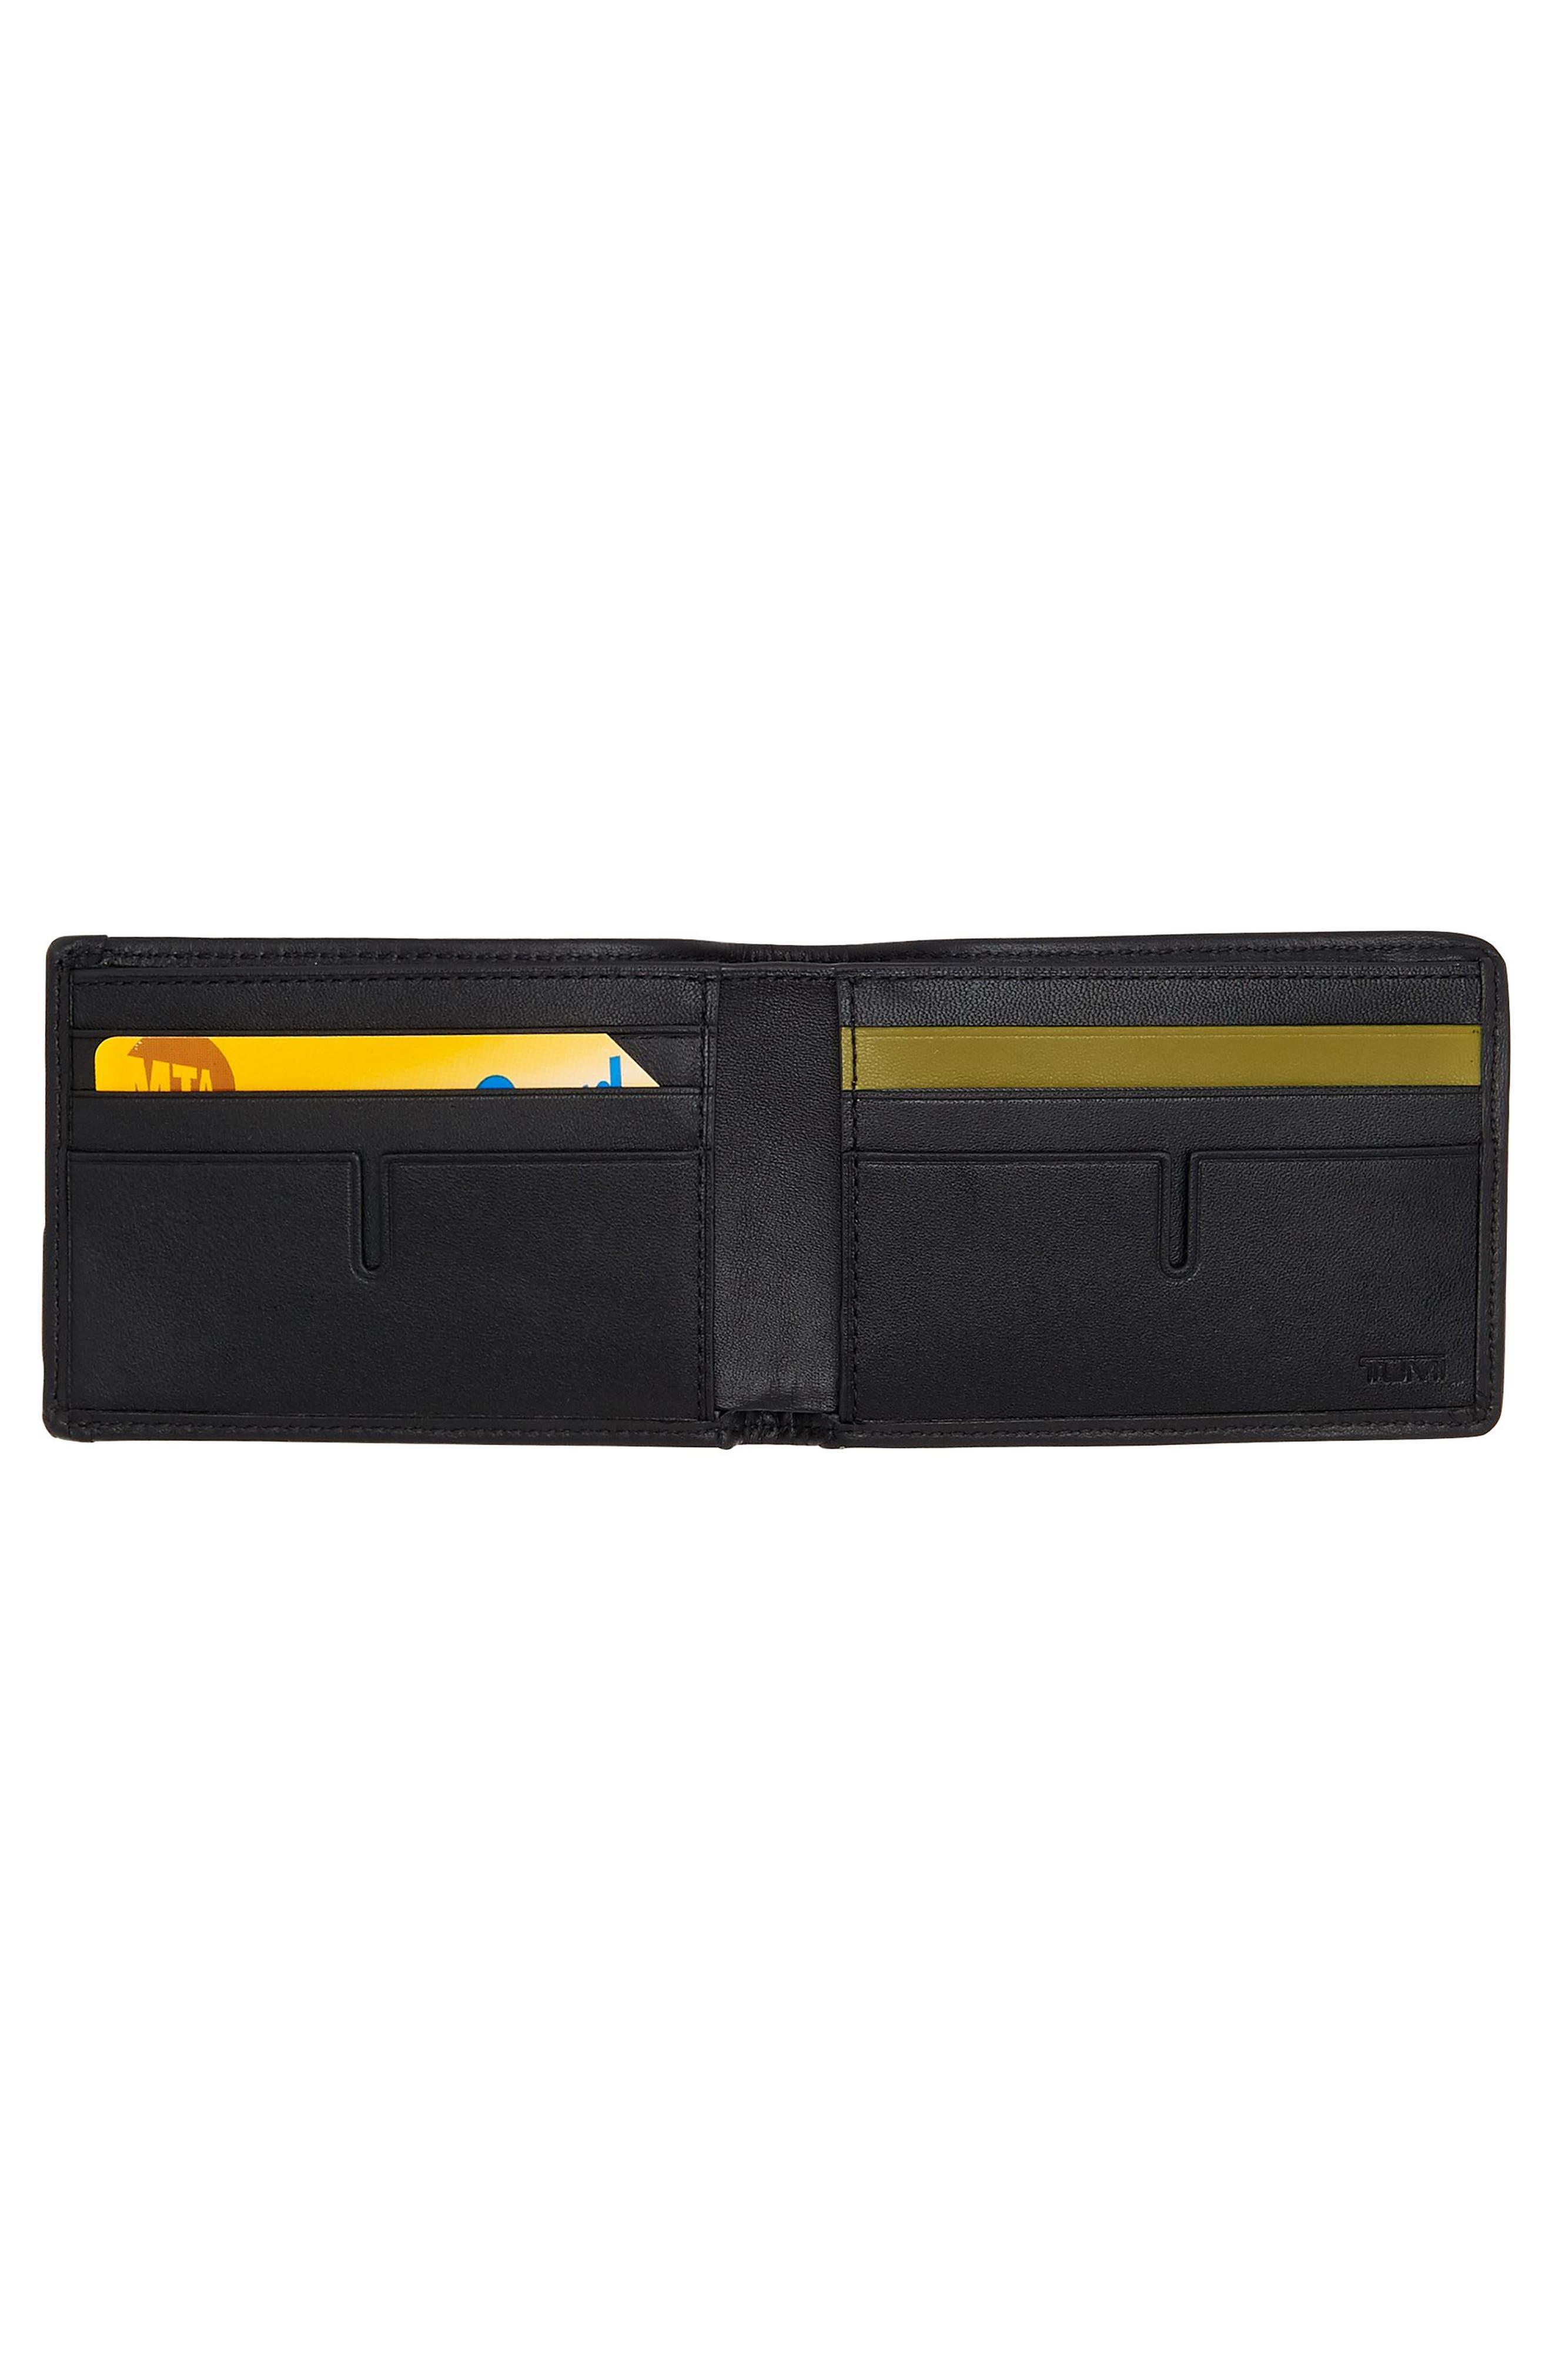 Alpha Bifold Wallet,                             Alternate thumbnail 2, color,                             314